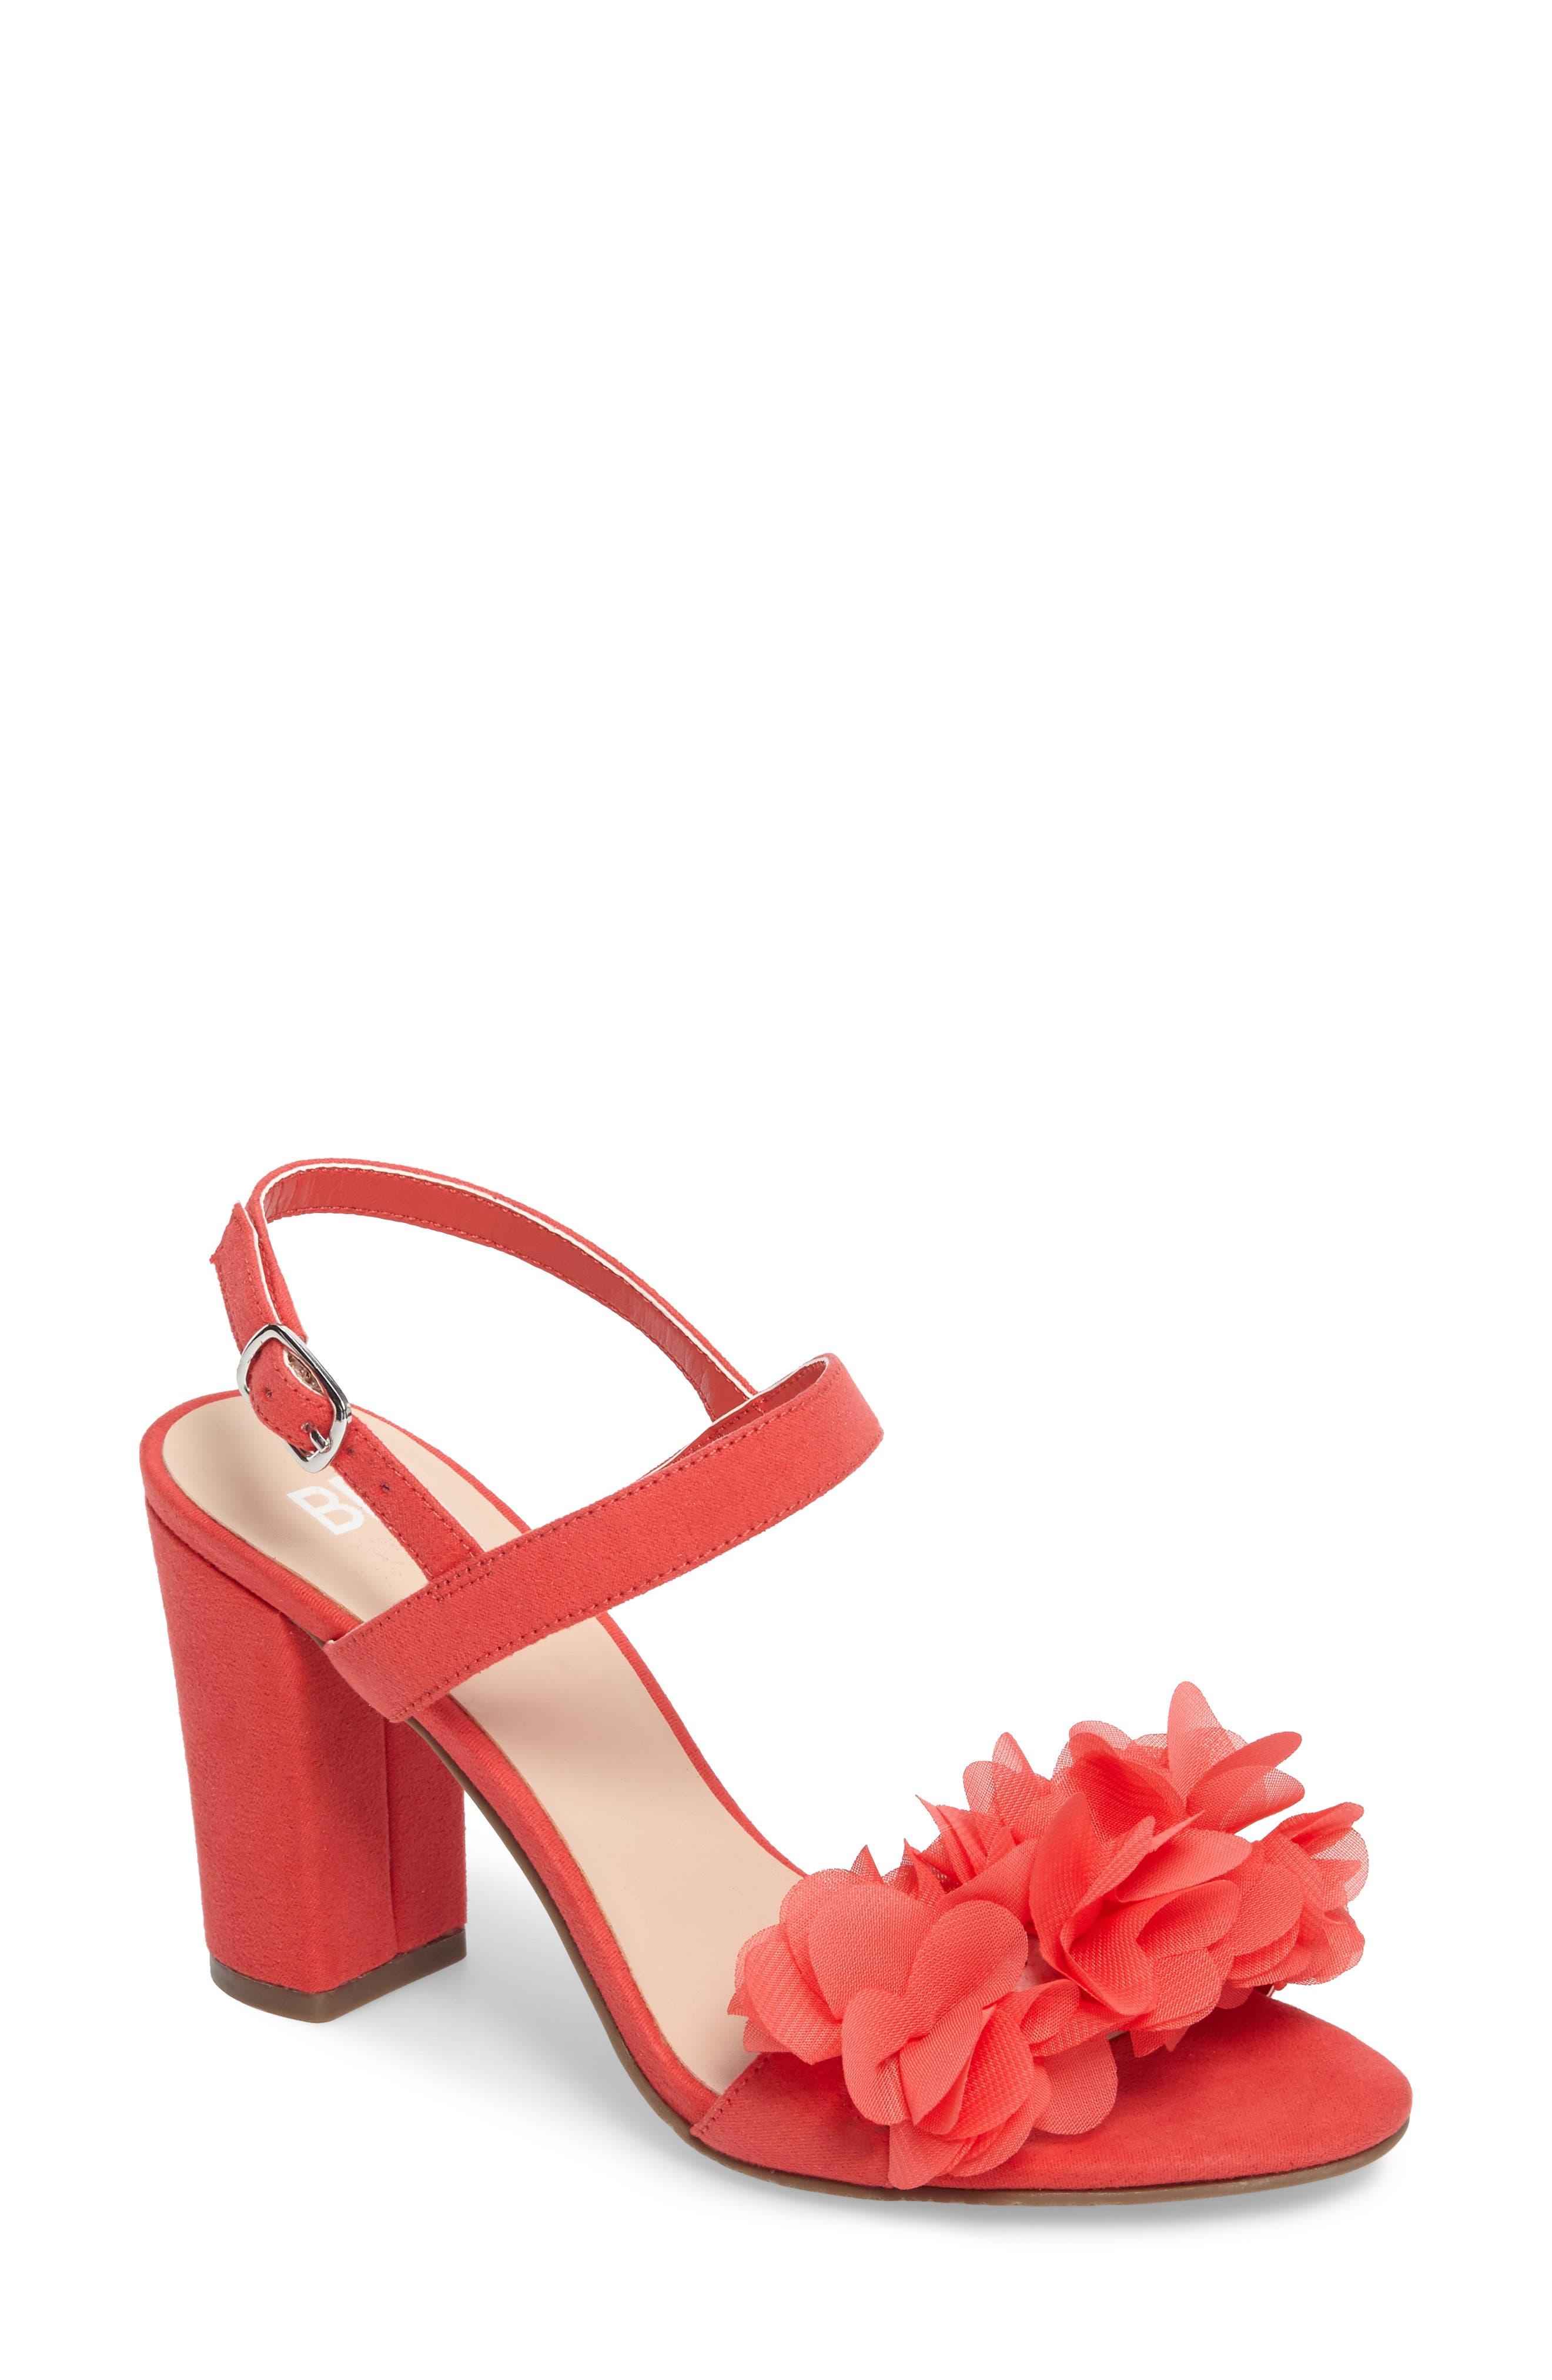 Lula Block Heel Slingback Sandal,                         Main,                         color, Coral Flowers Faux Suede